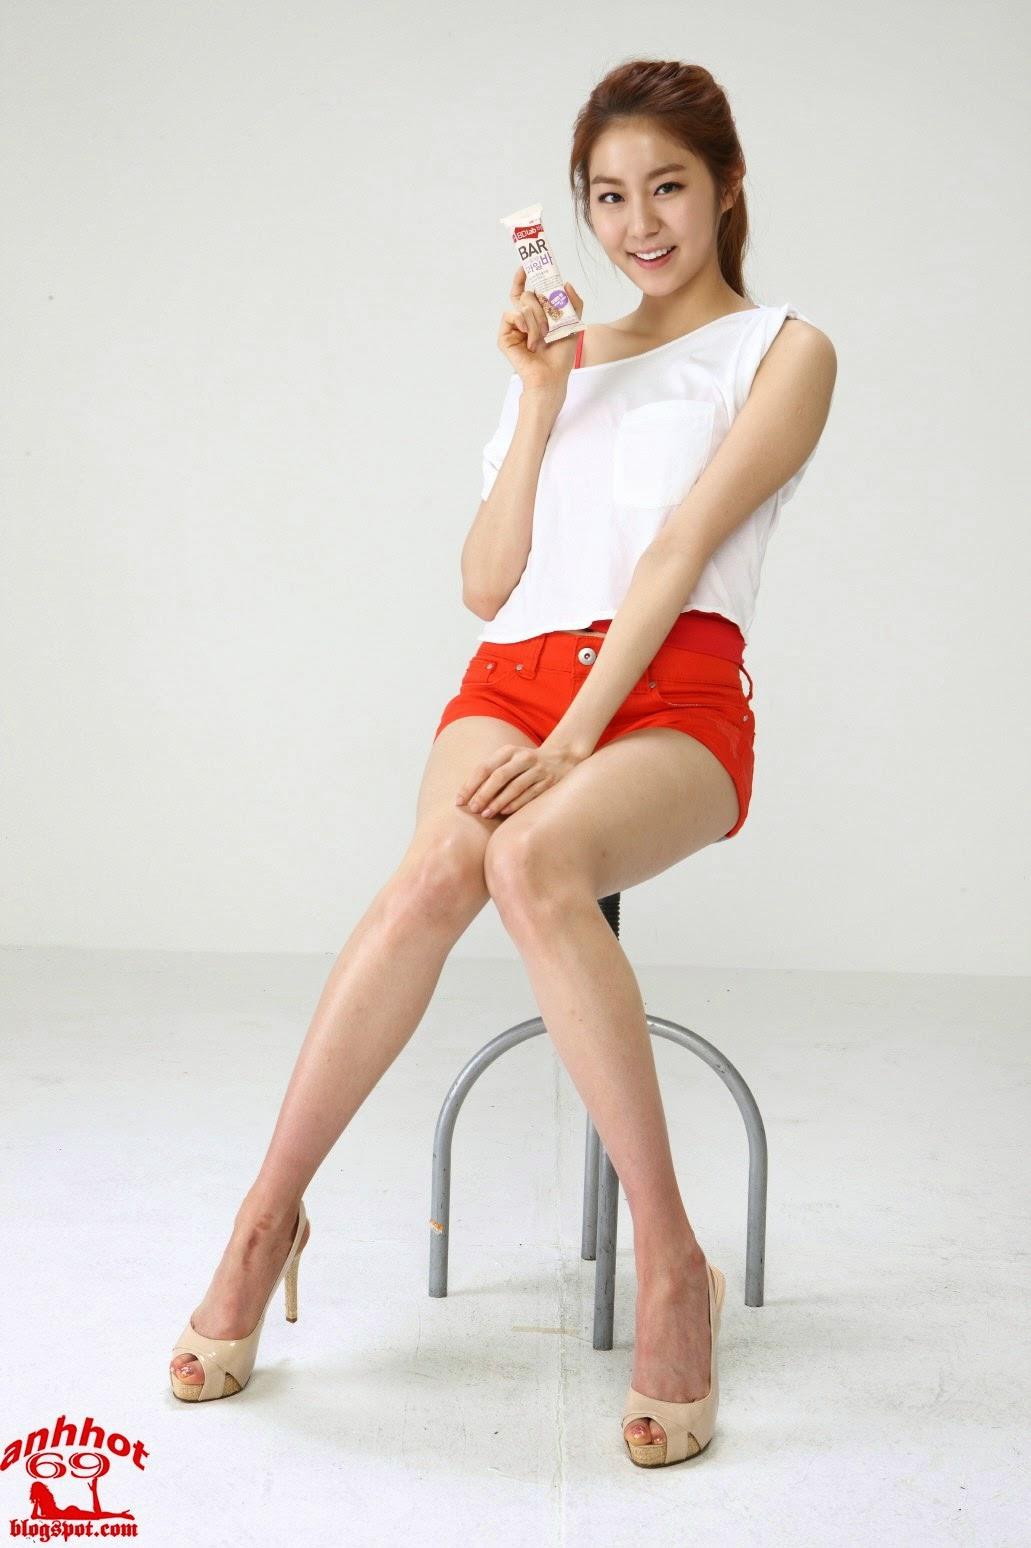 Kpop-Start-Hot_BaYbN